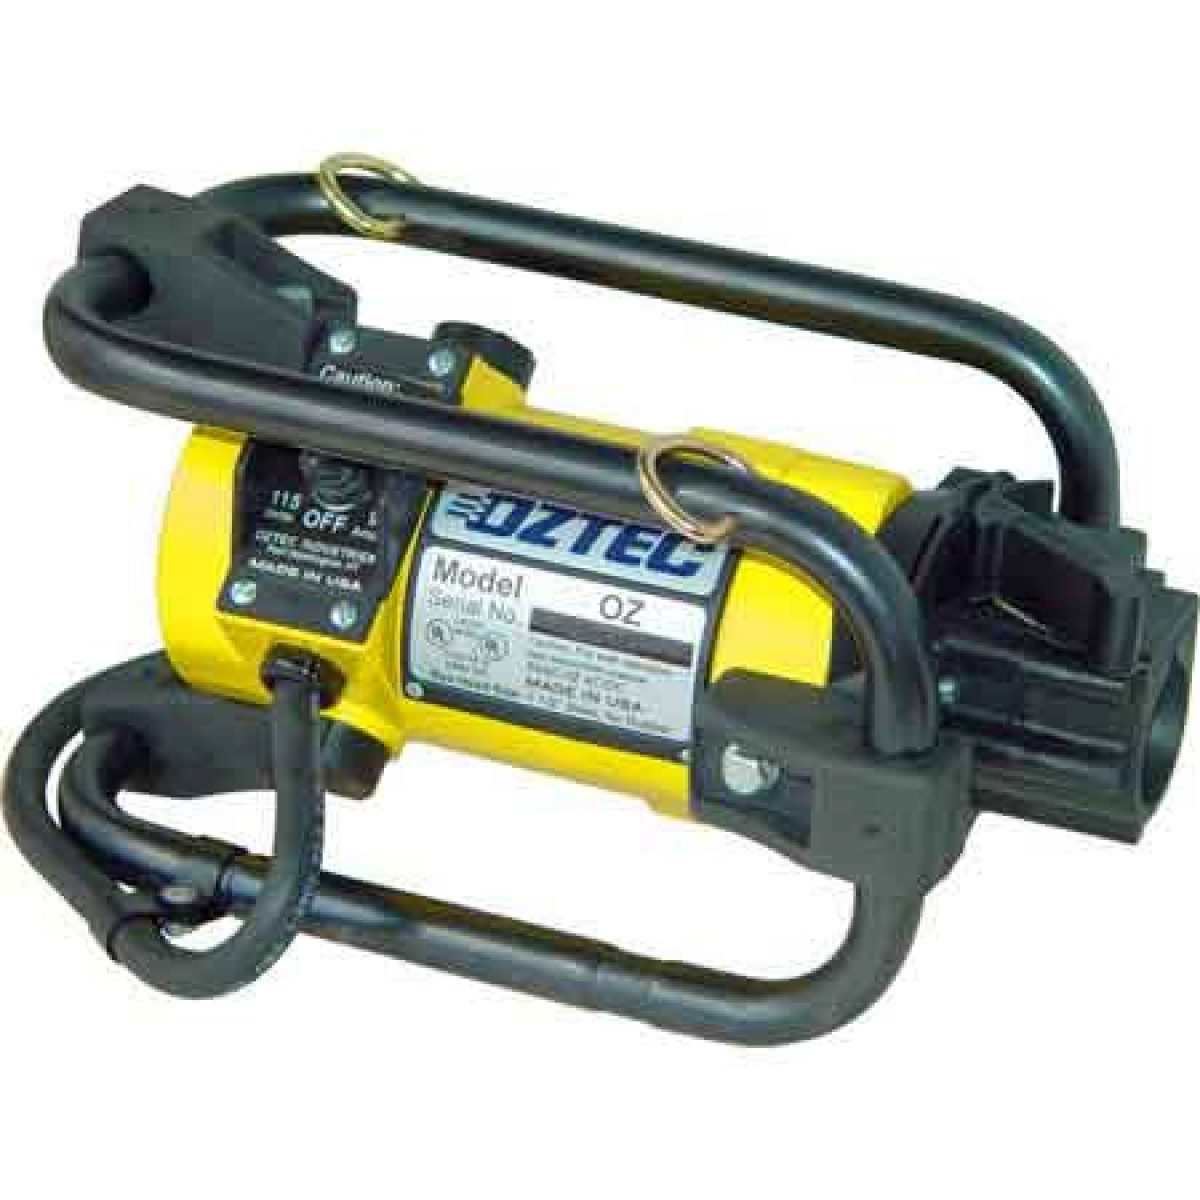 External Vibrator - Shutter Vibrator Latest Price ...